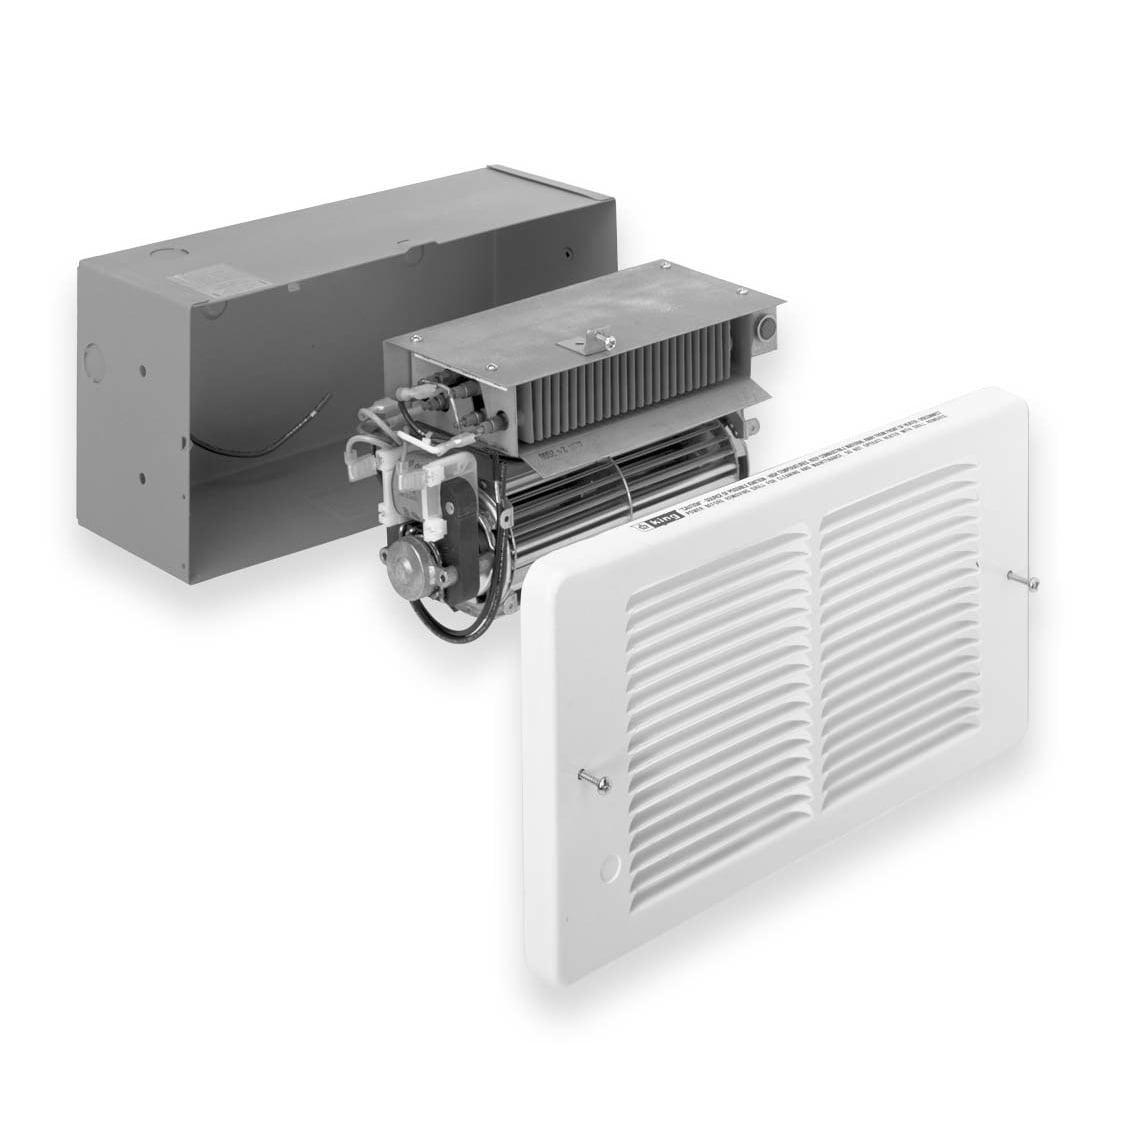 King Electrical Paw2422 2250 Watt 7680 Btu Pic A Compact Electric Furnace Wiring Diagram Wall Heater